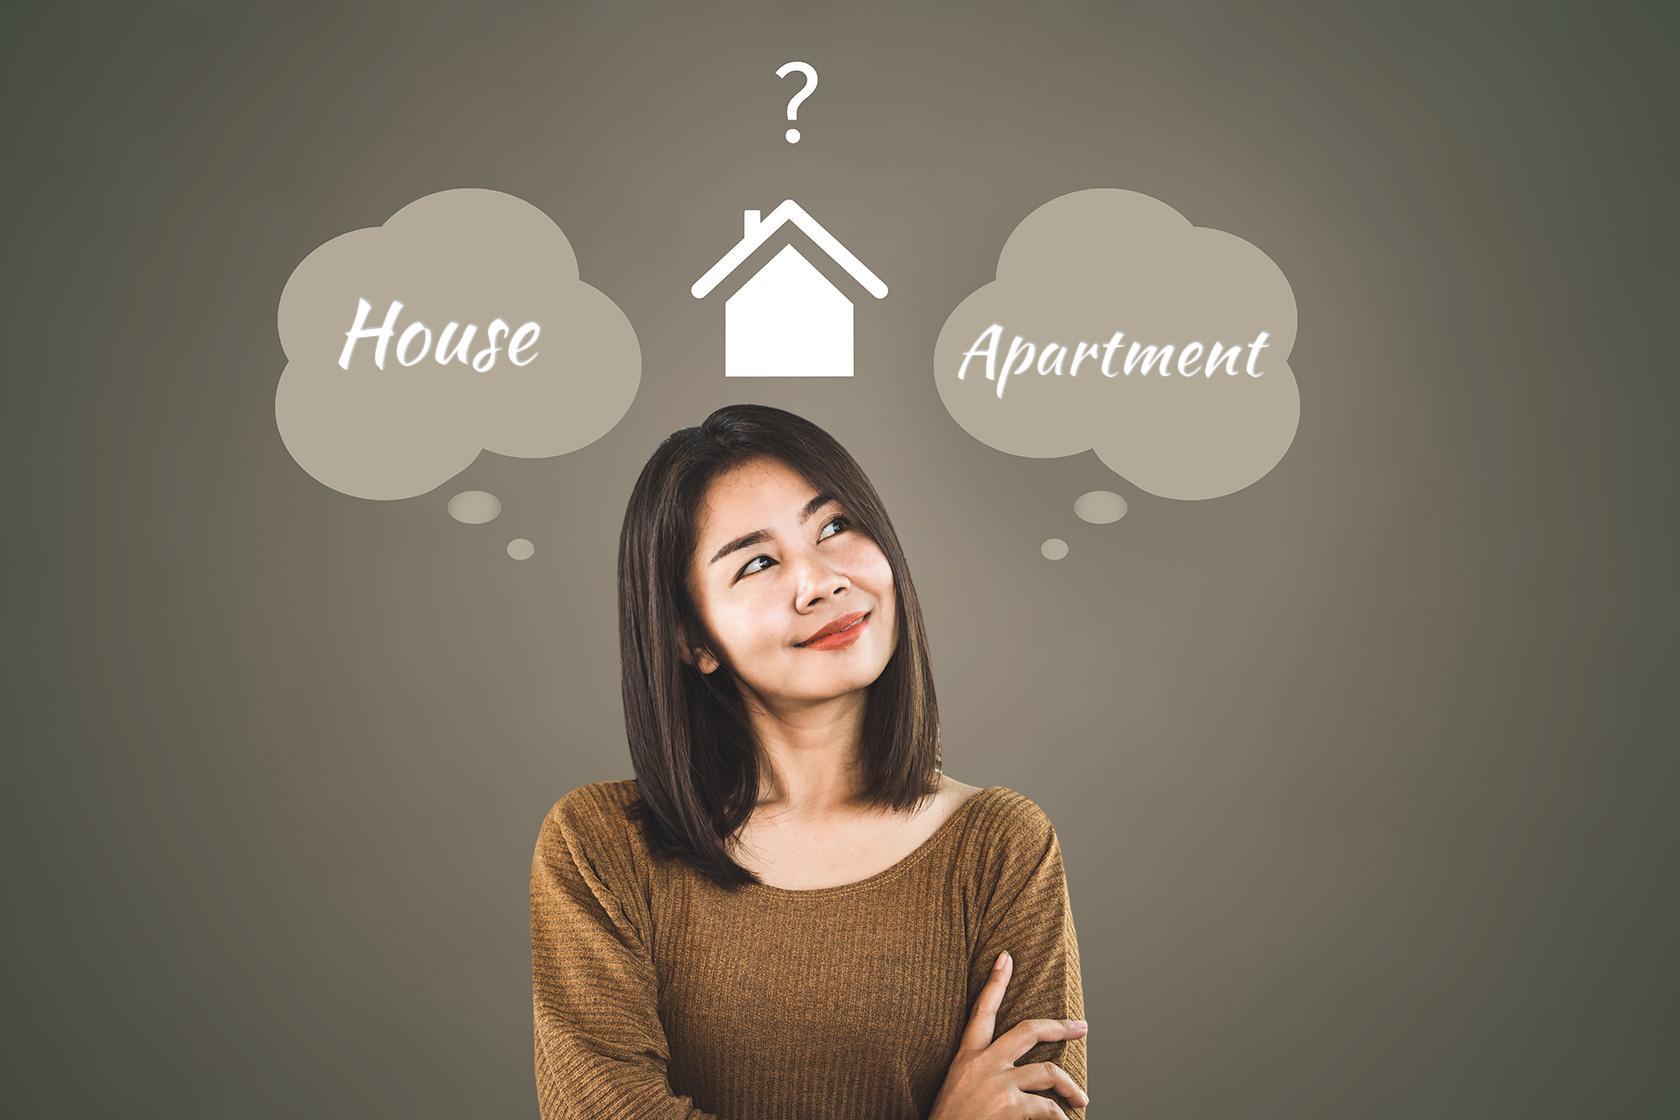 Houses Versus Apartments